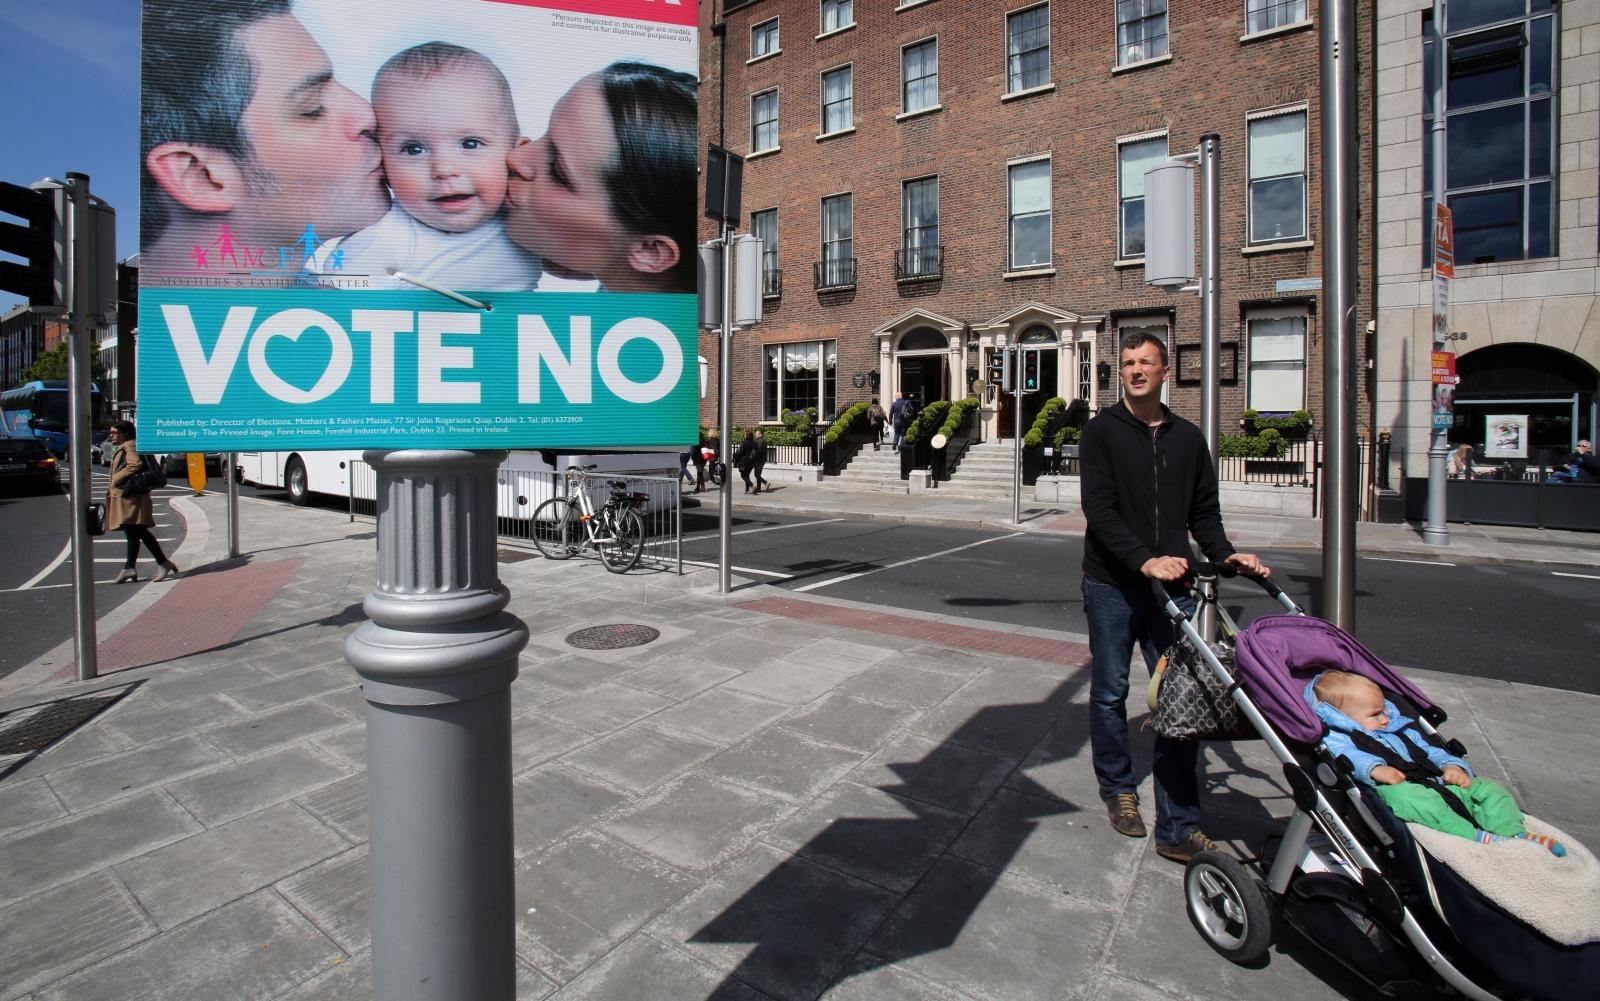 Same-sex marriage referendum Ireland